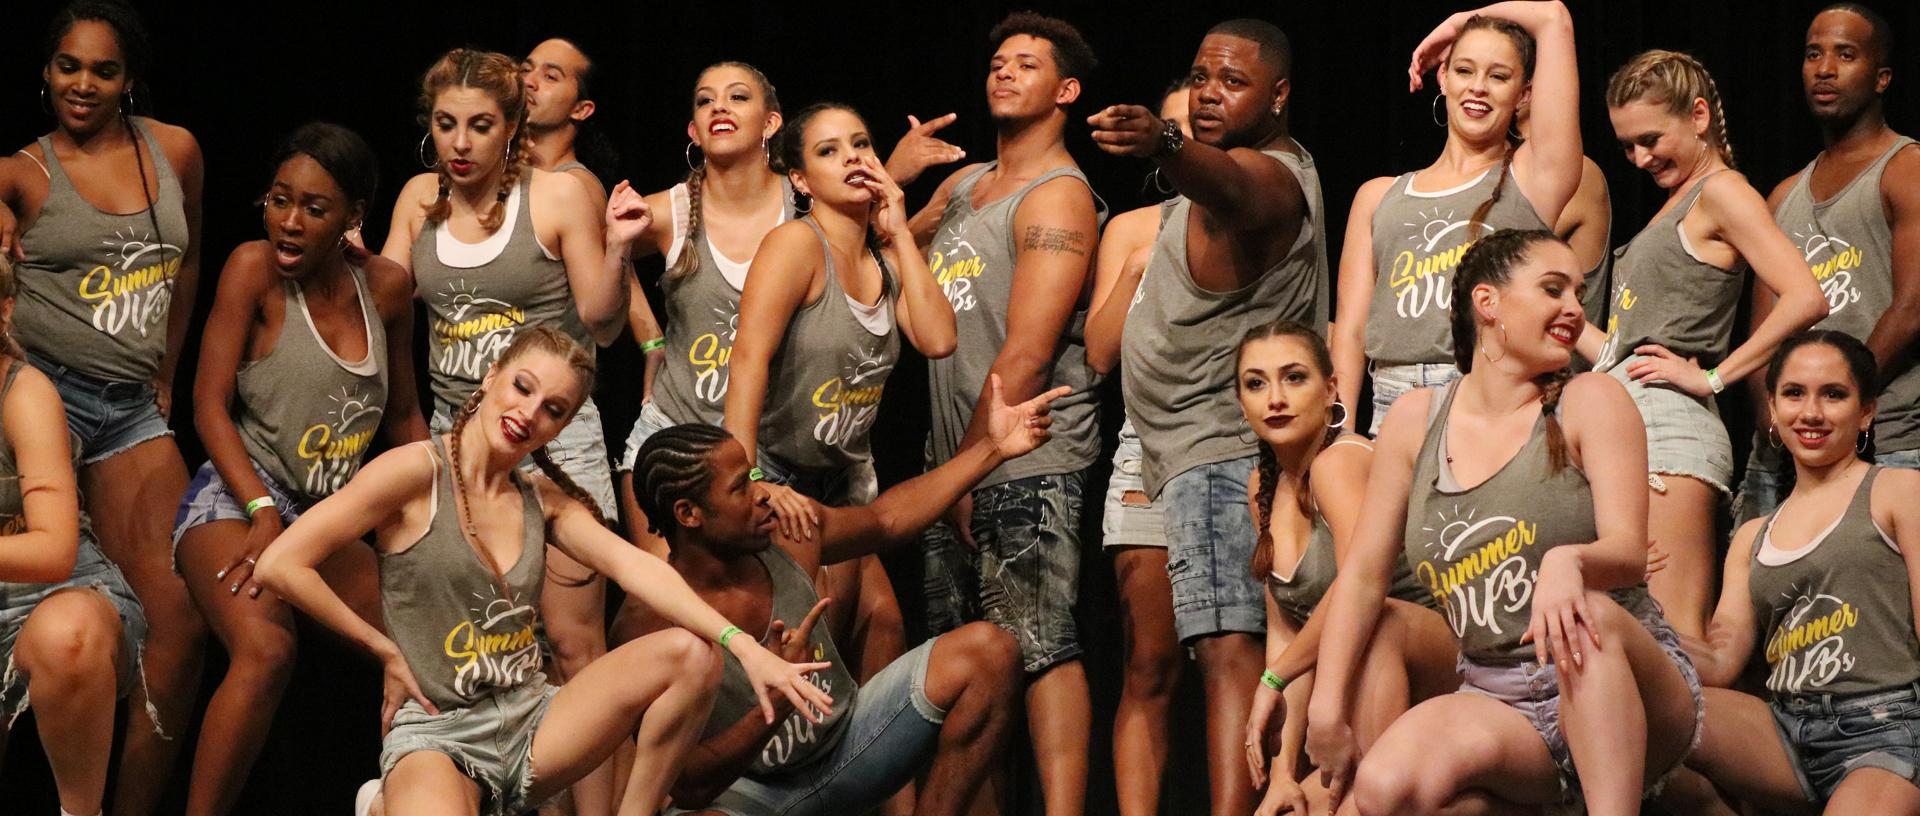 UDF – URBAN DANCE FESTIVAL FLORIDA 2018